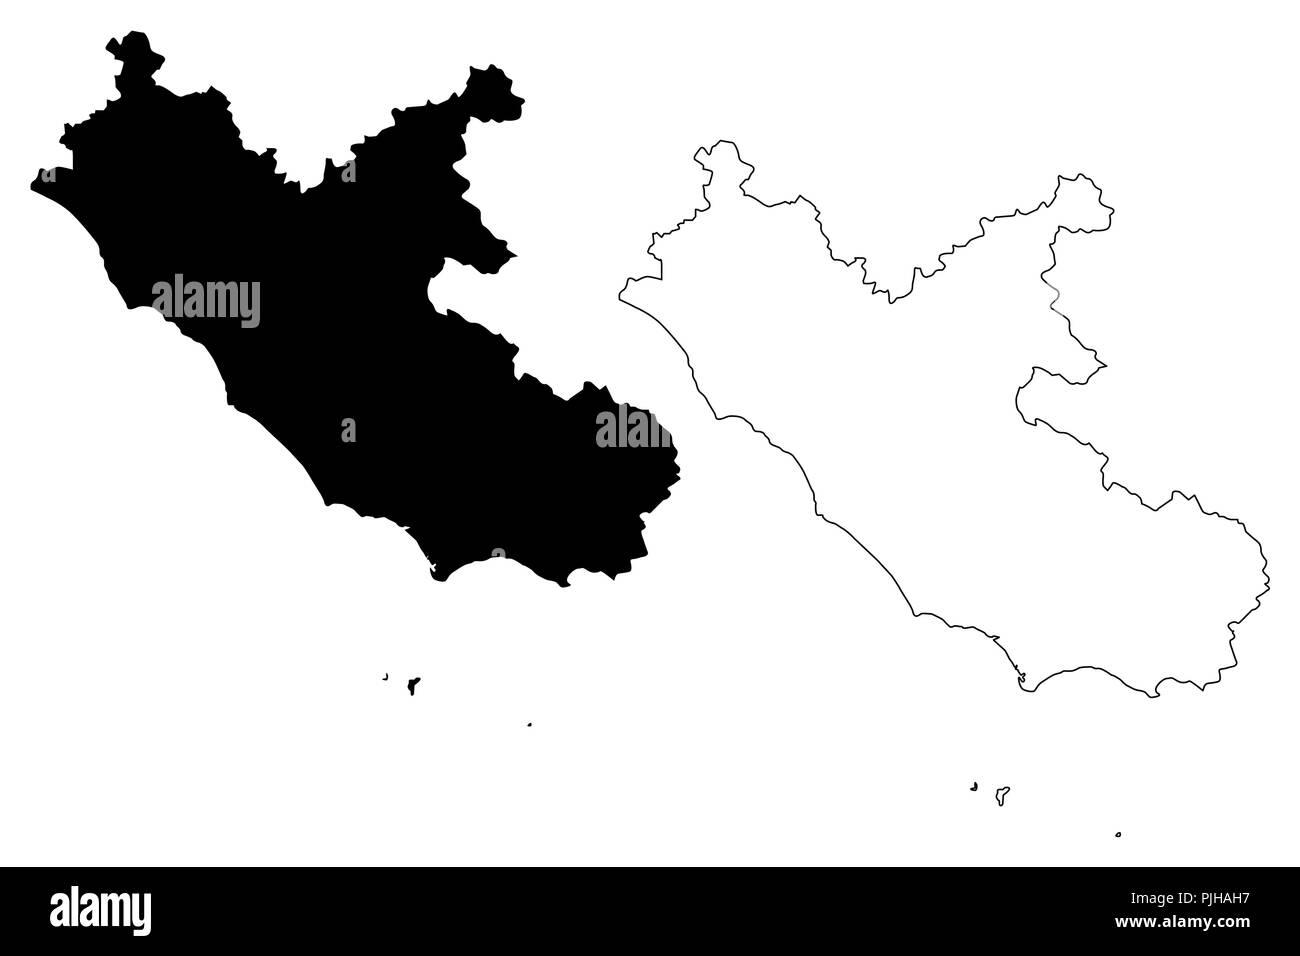 Cartina Lazio.Lazio Map High Resolution Stock Photography And Images Alamy